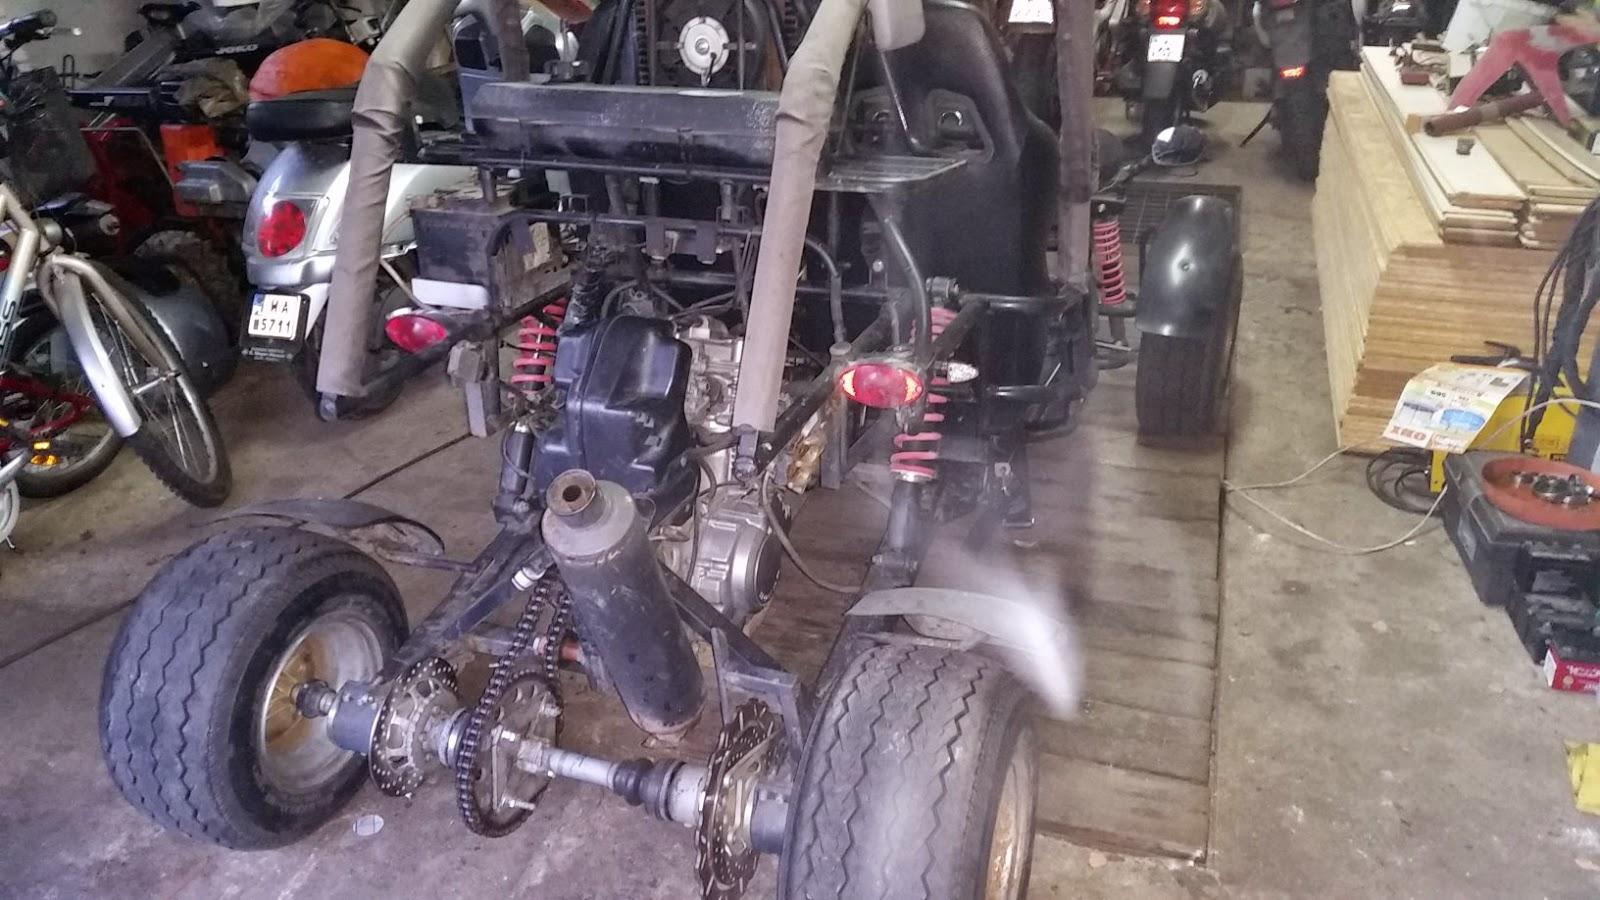 Project Buggy Dazon Raider 250 With Honda Cb500 Engine Wizyta W